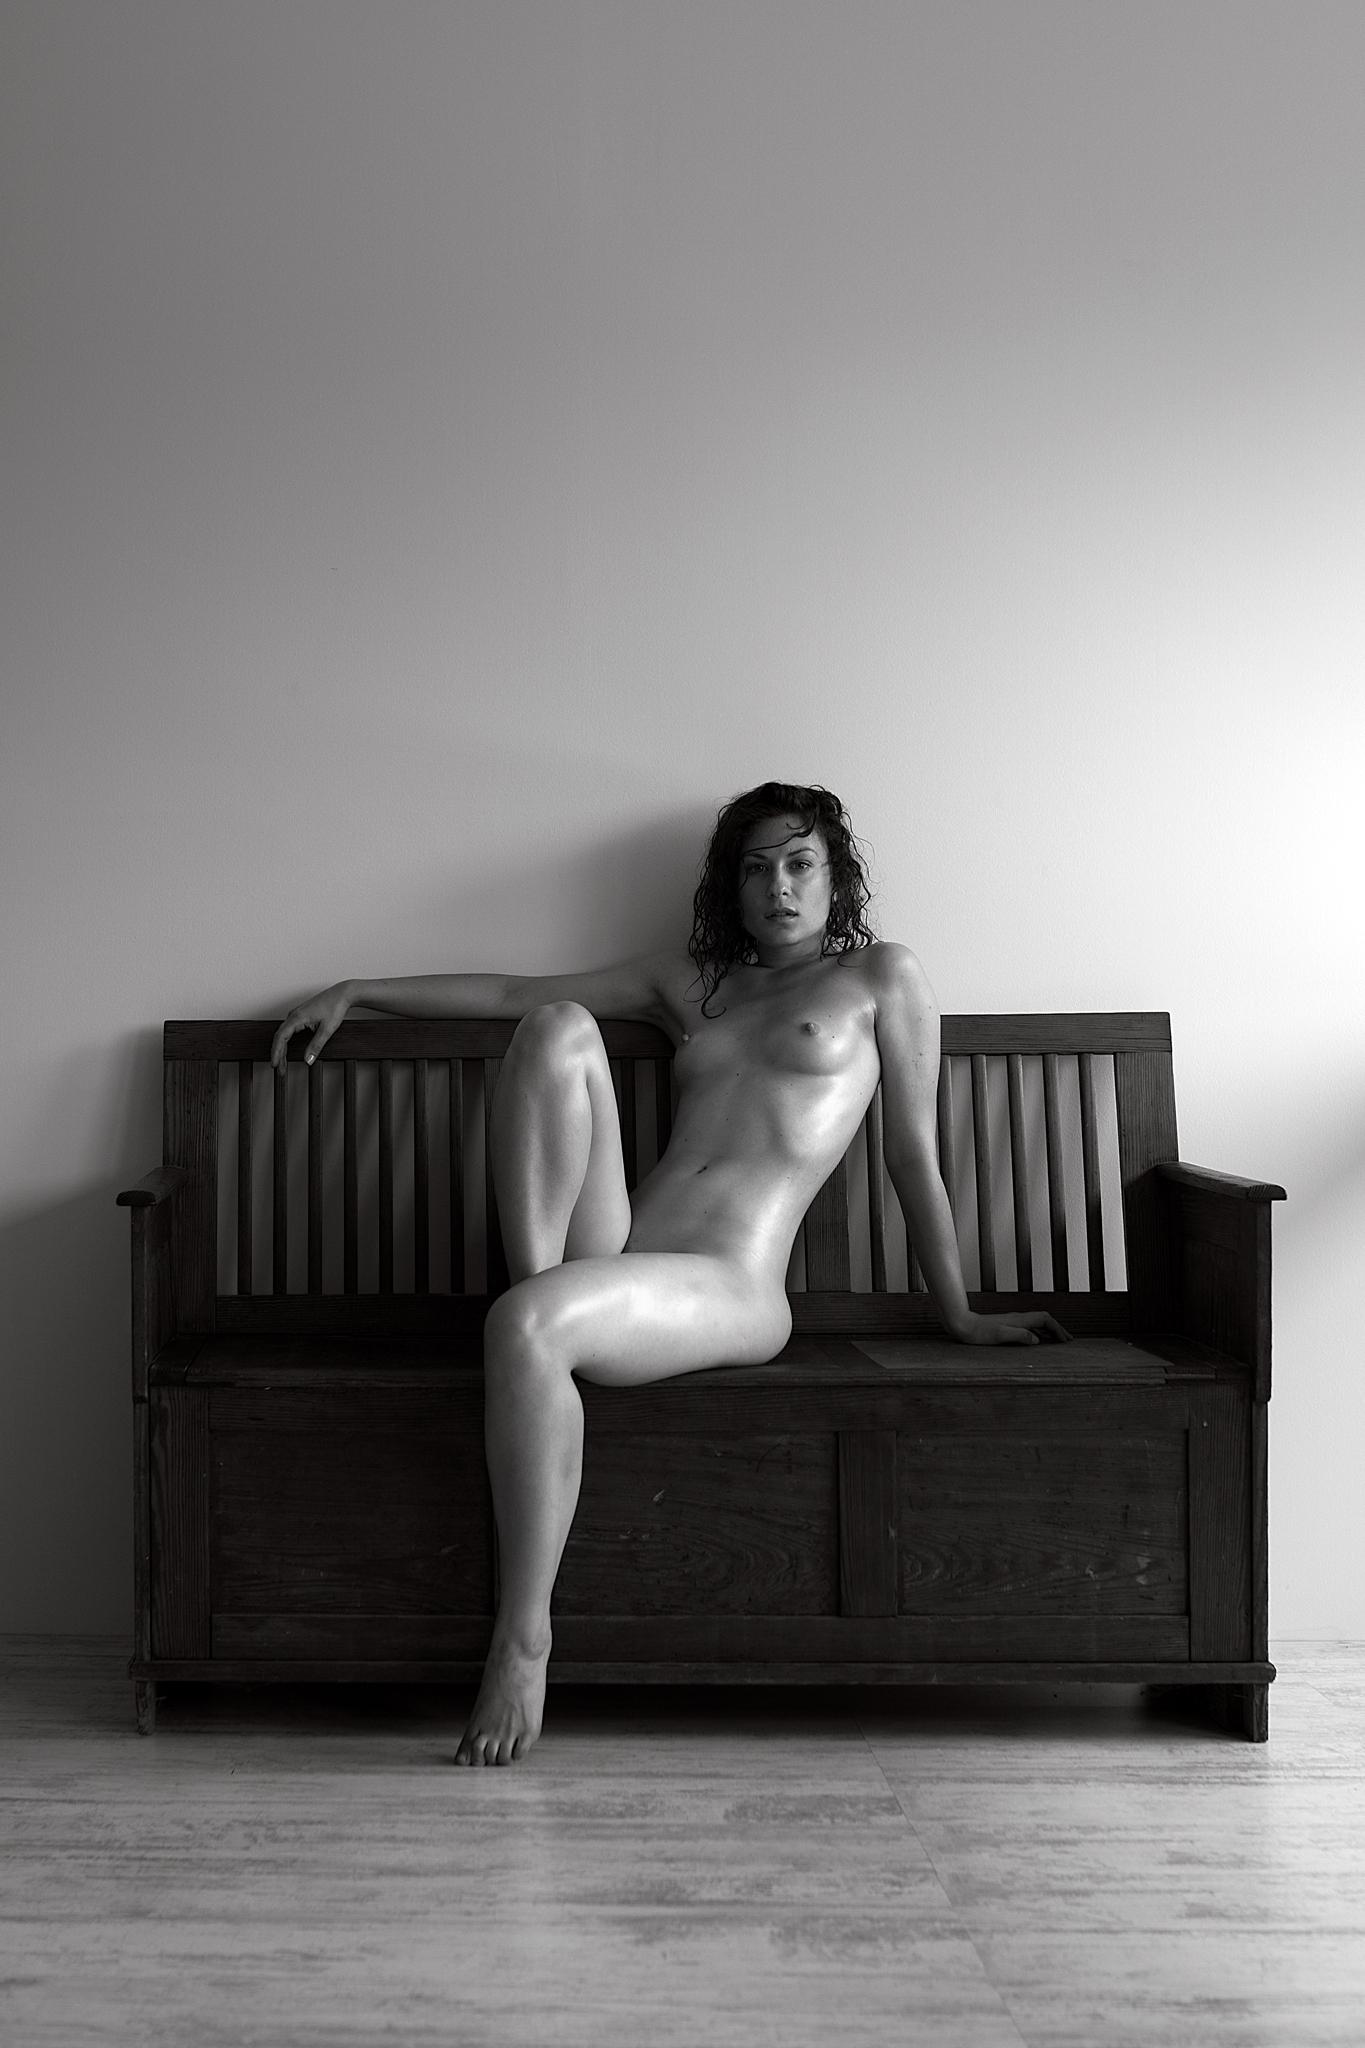 Cristine Reyes Nude Photos Leaked Online